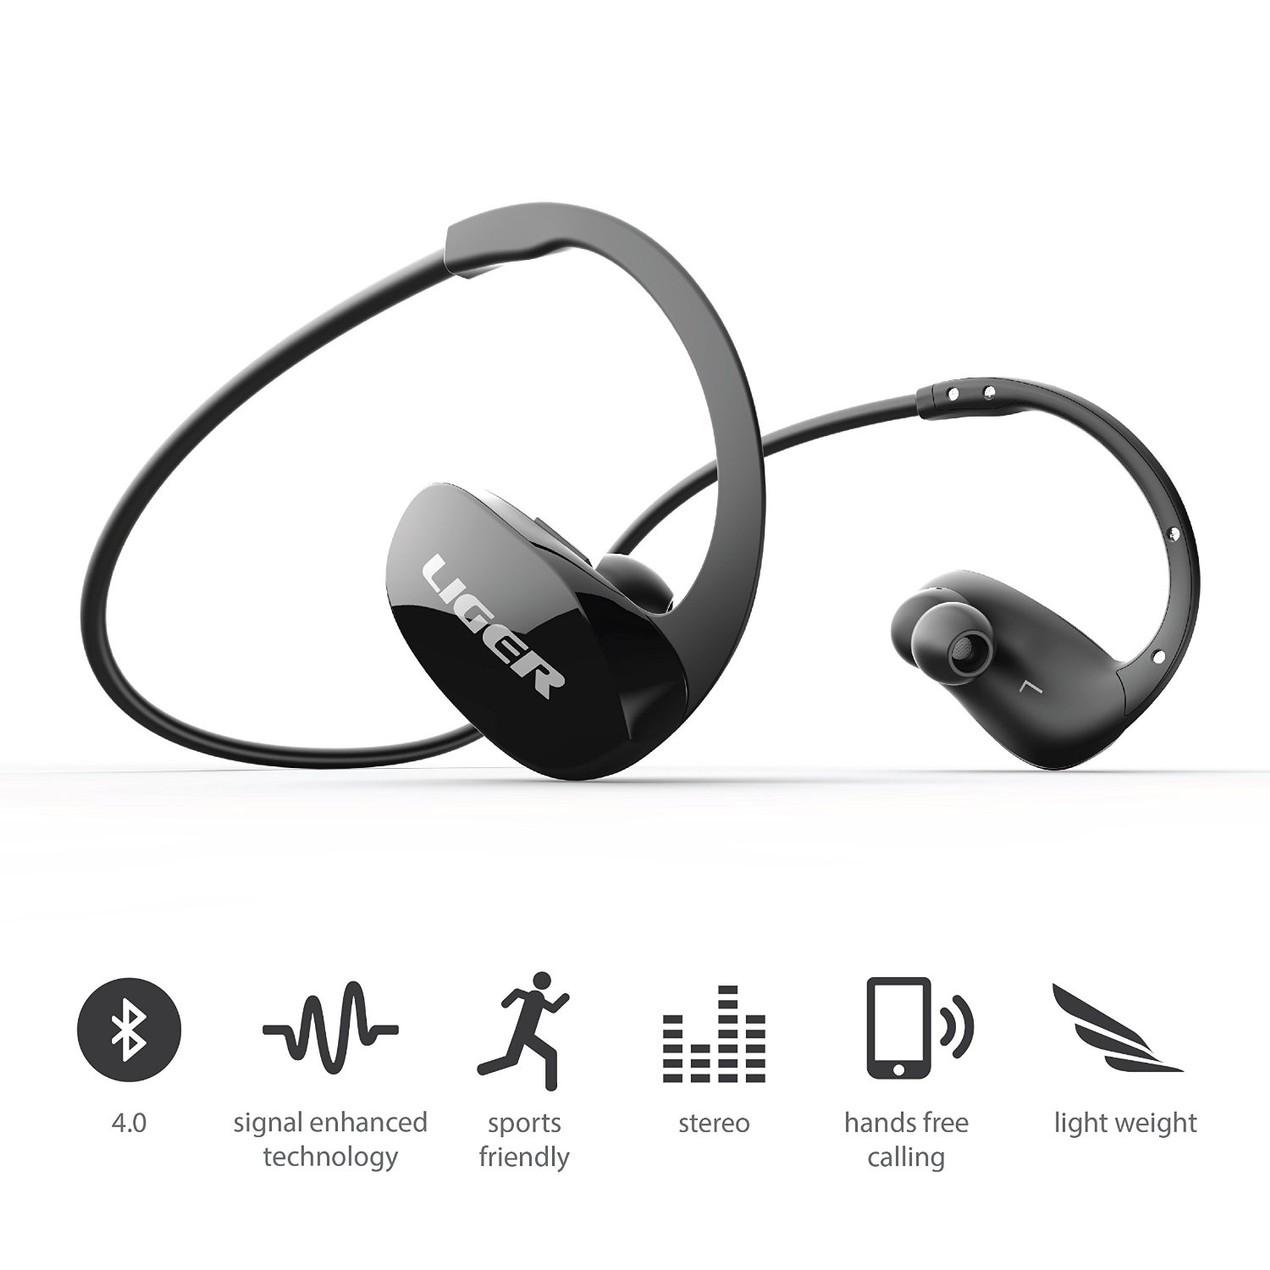 d387088fe1f ... Liger XS900 Wireless Bluetooth 4.1 Headphones Noise Cancelling  Headphones ...